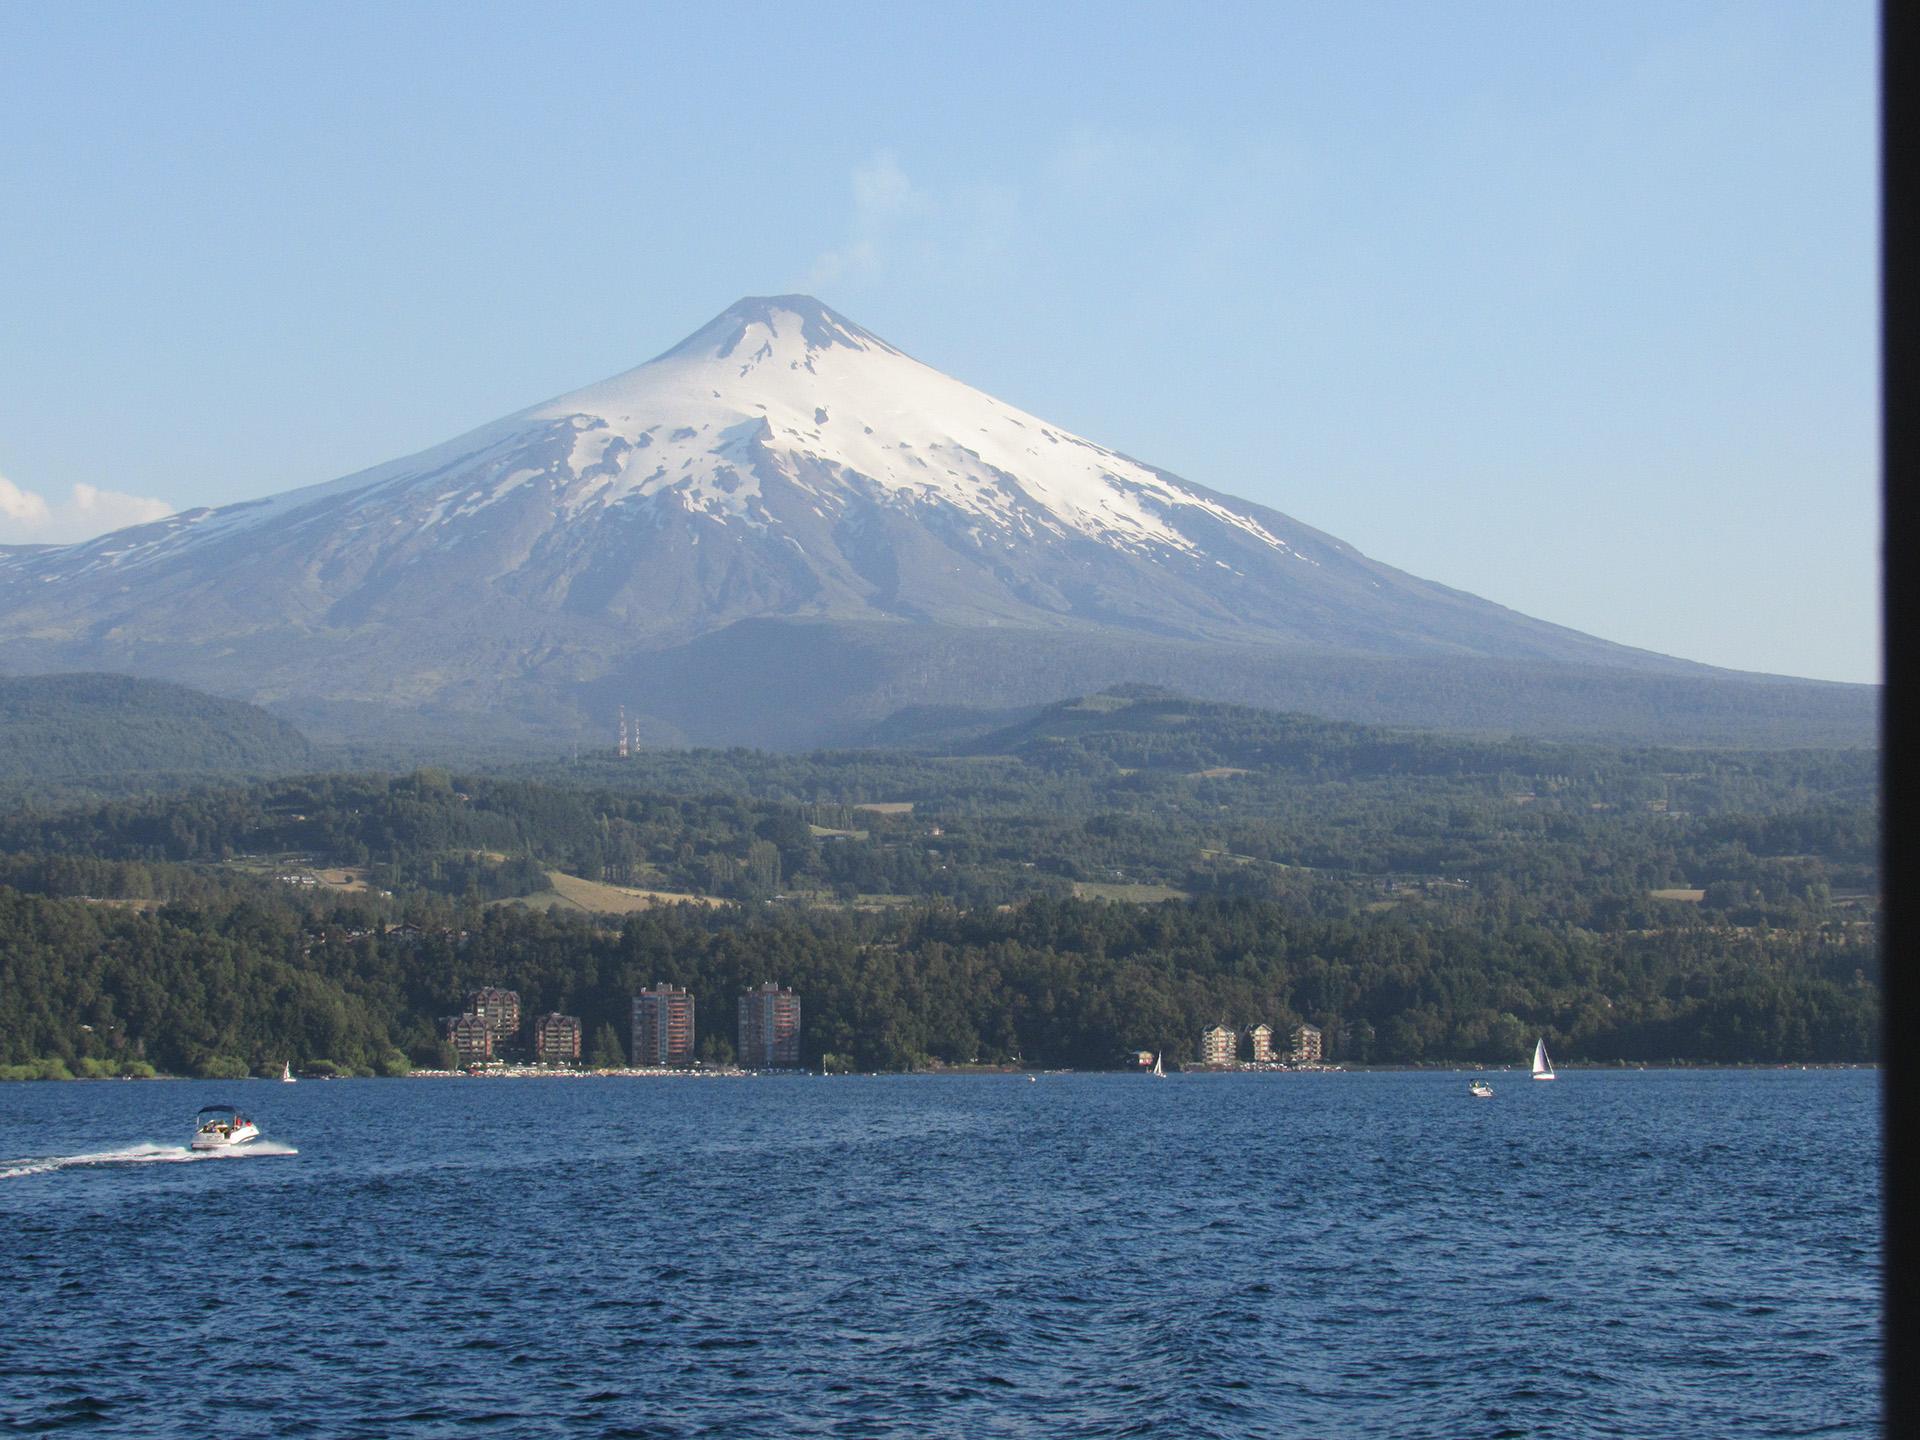 El gran volcán Villarrica